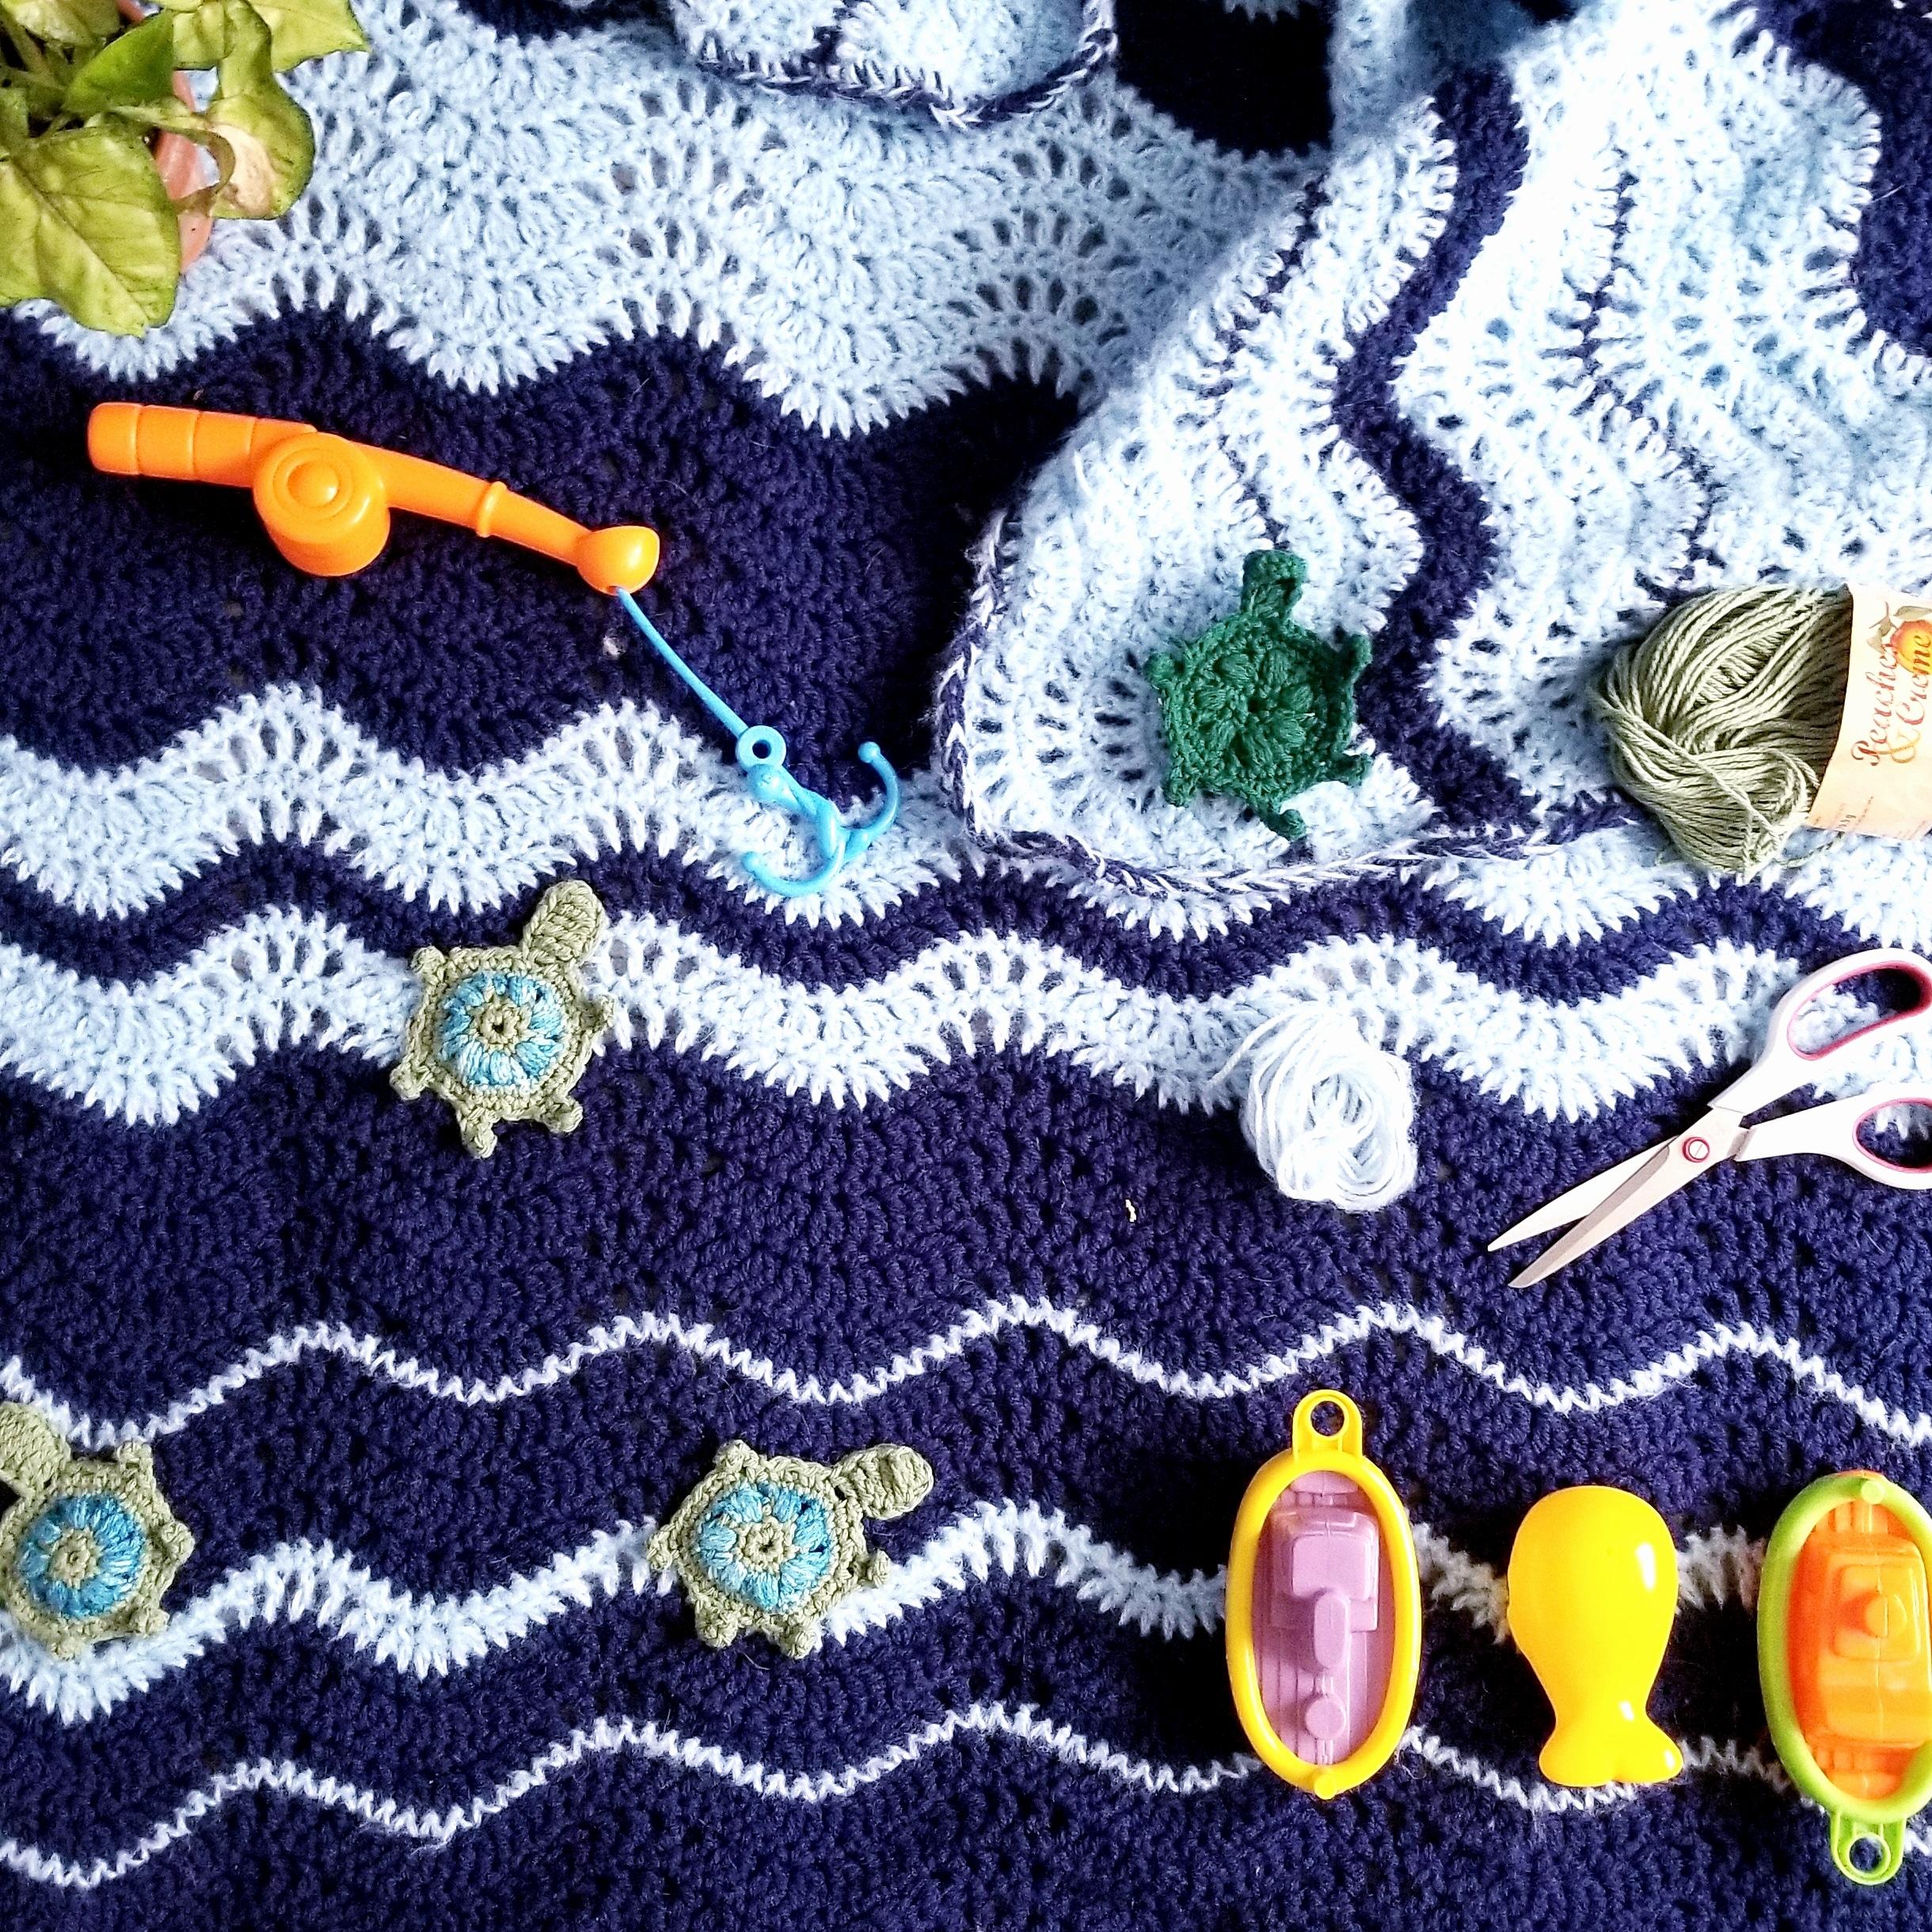 Crochet Turtle Applique on the Destin Blanket